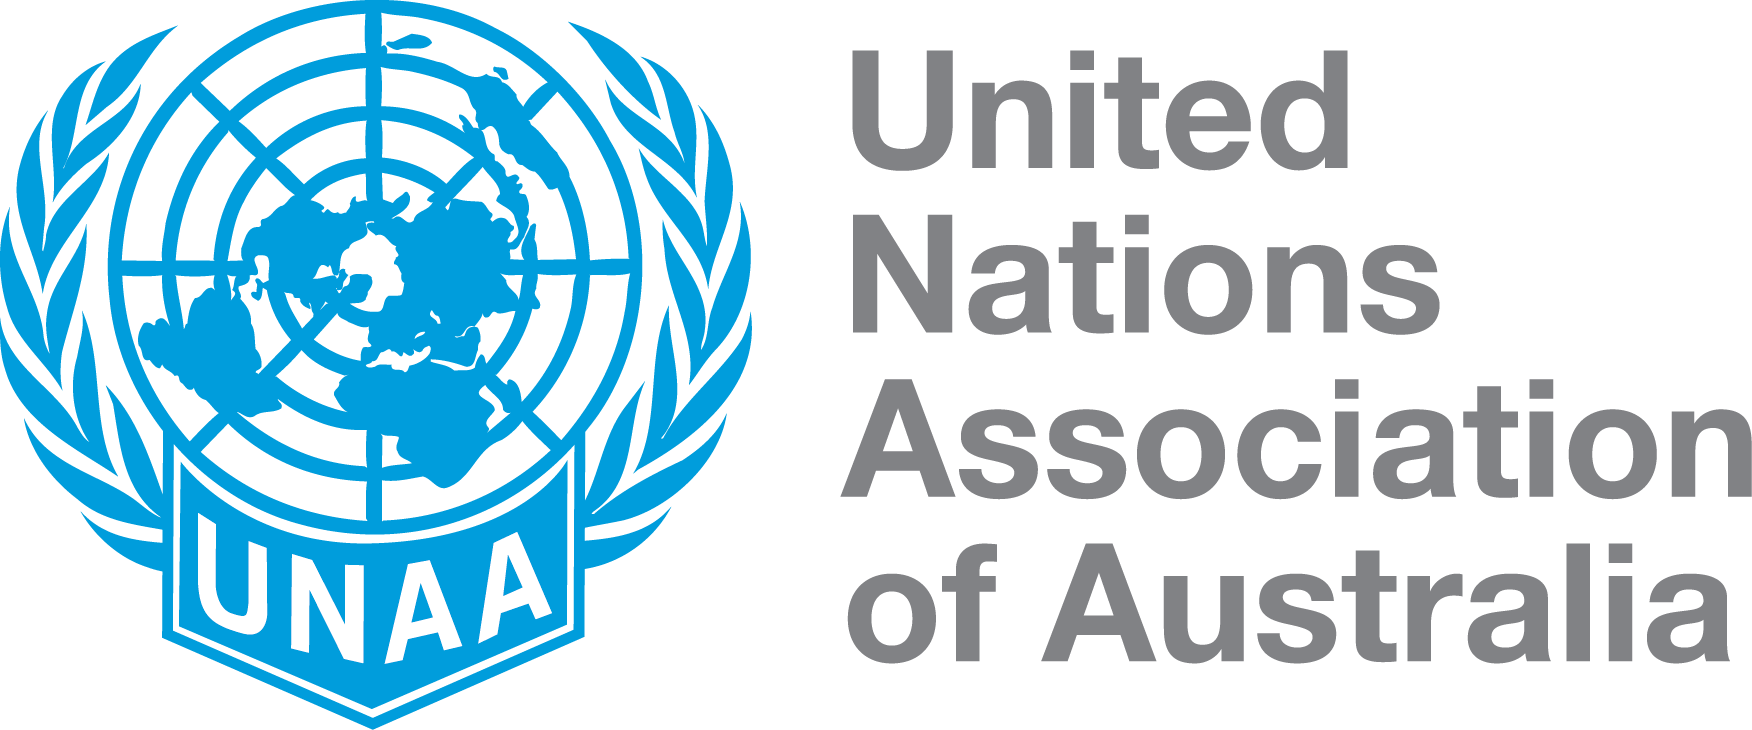 United Nations Association of Australia